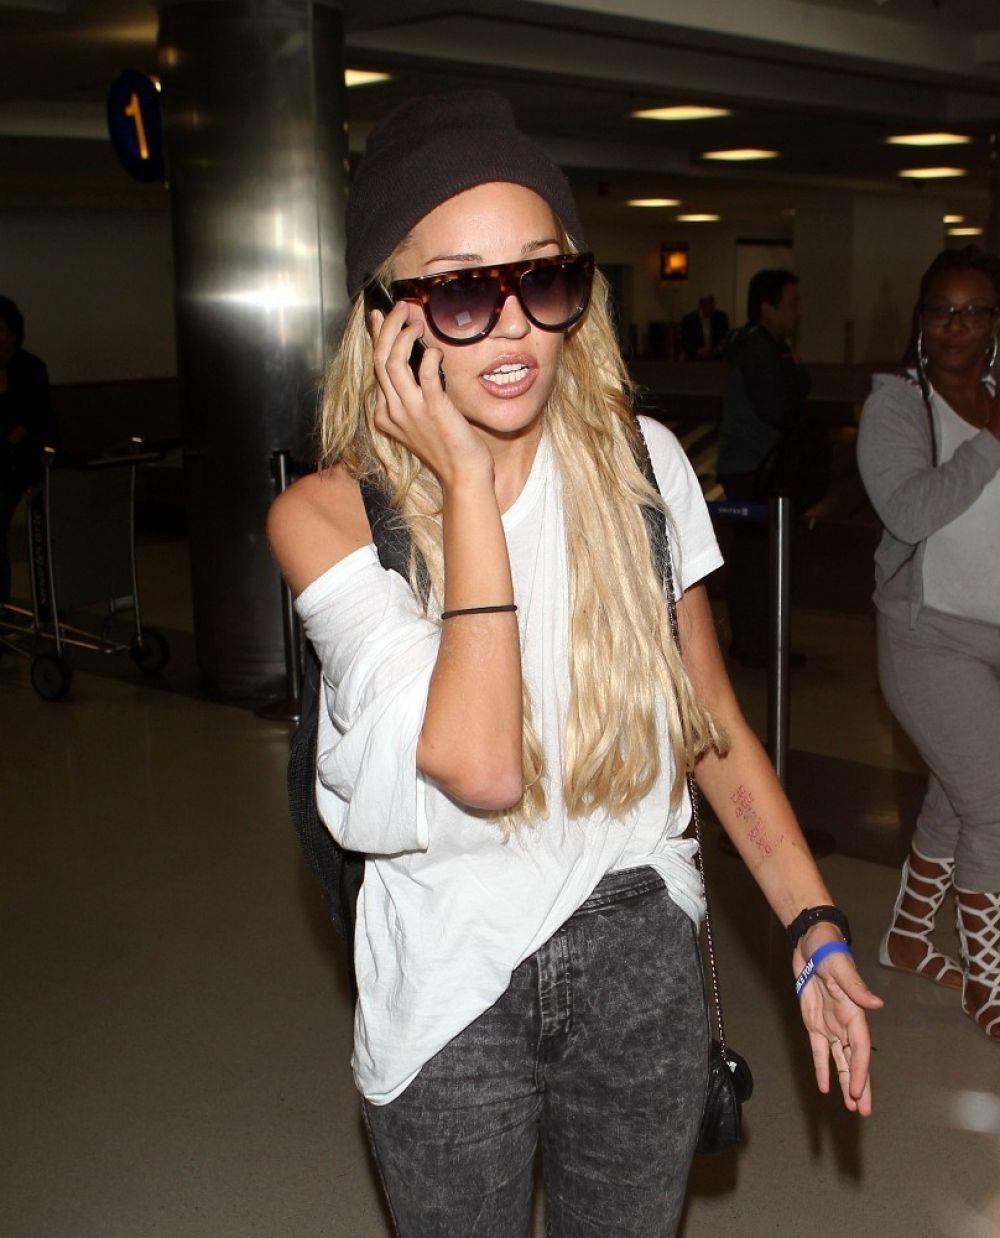 AMANDA BYNES at Los Angeles International Airport